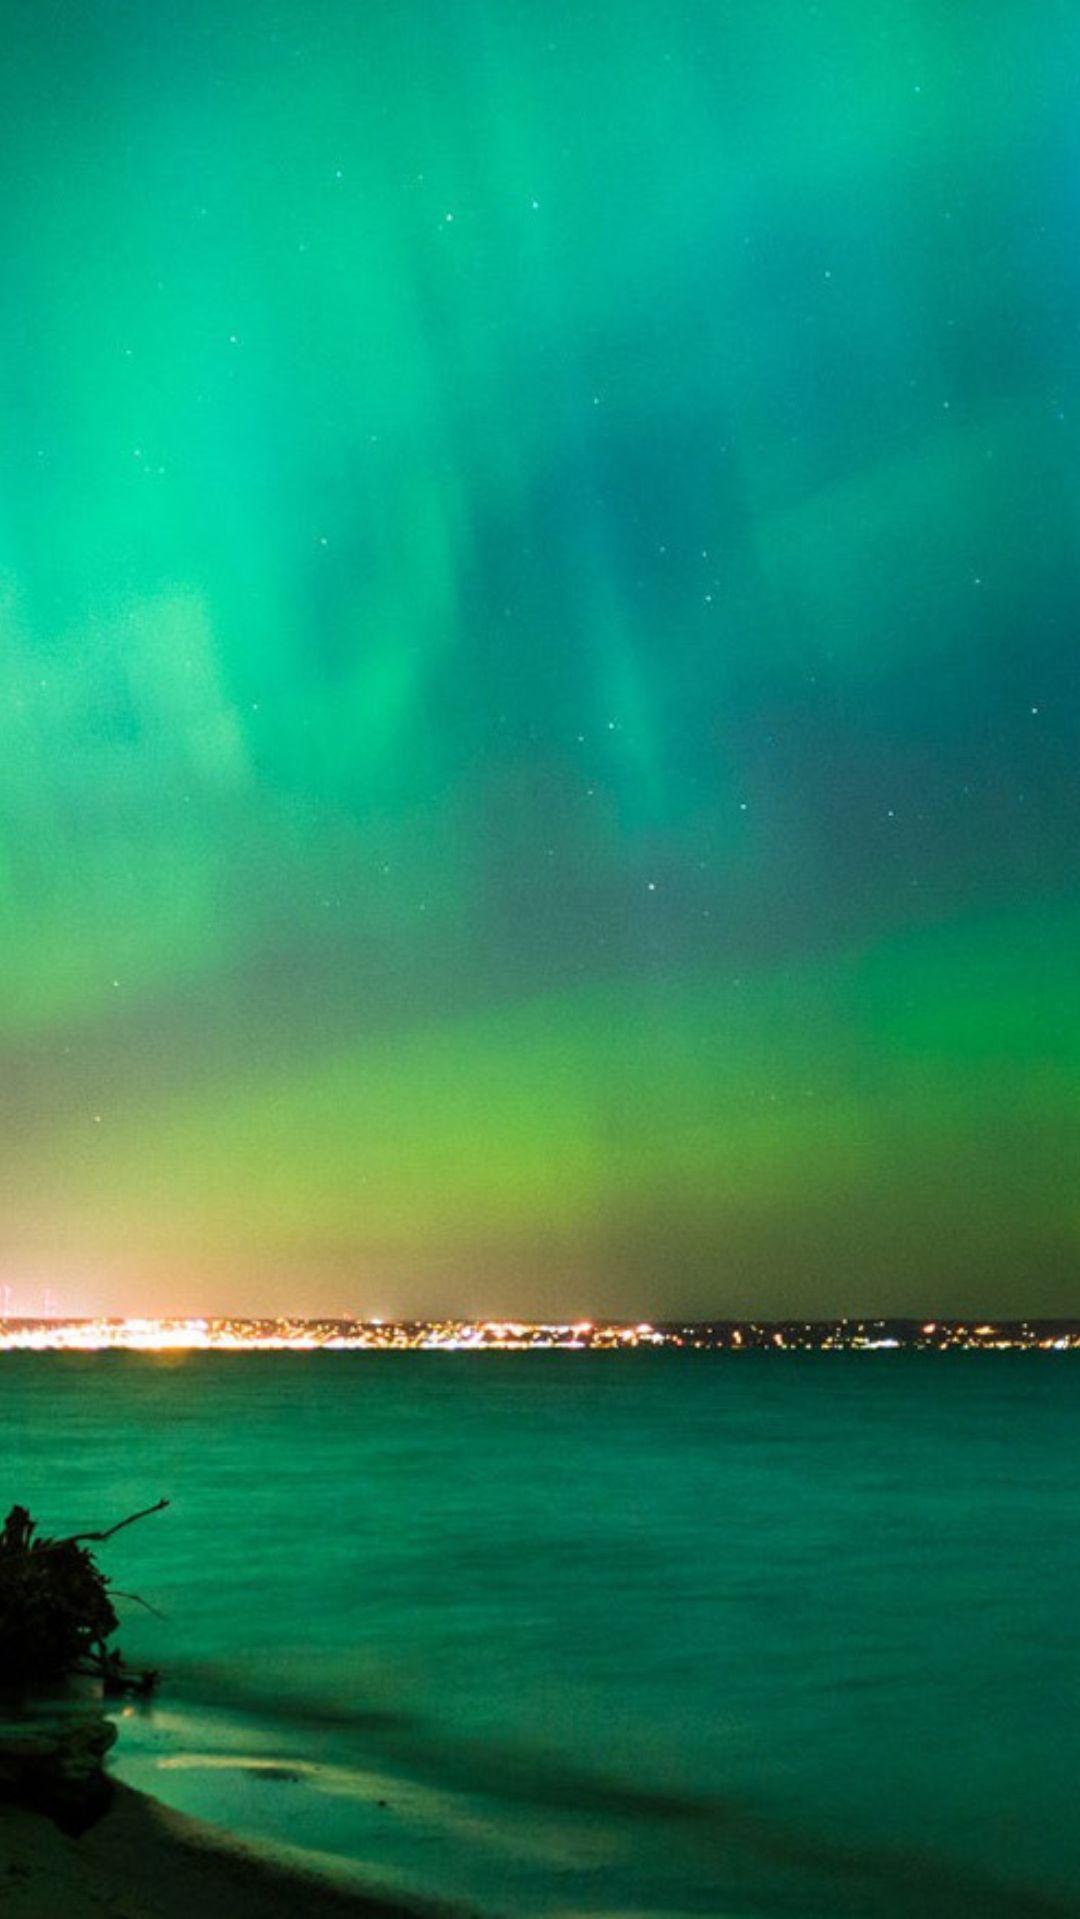 Panoramail Cielo Blula Luce Verdeil Mareh5le Nuvoleil Cielo